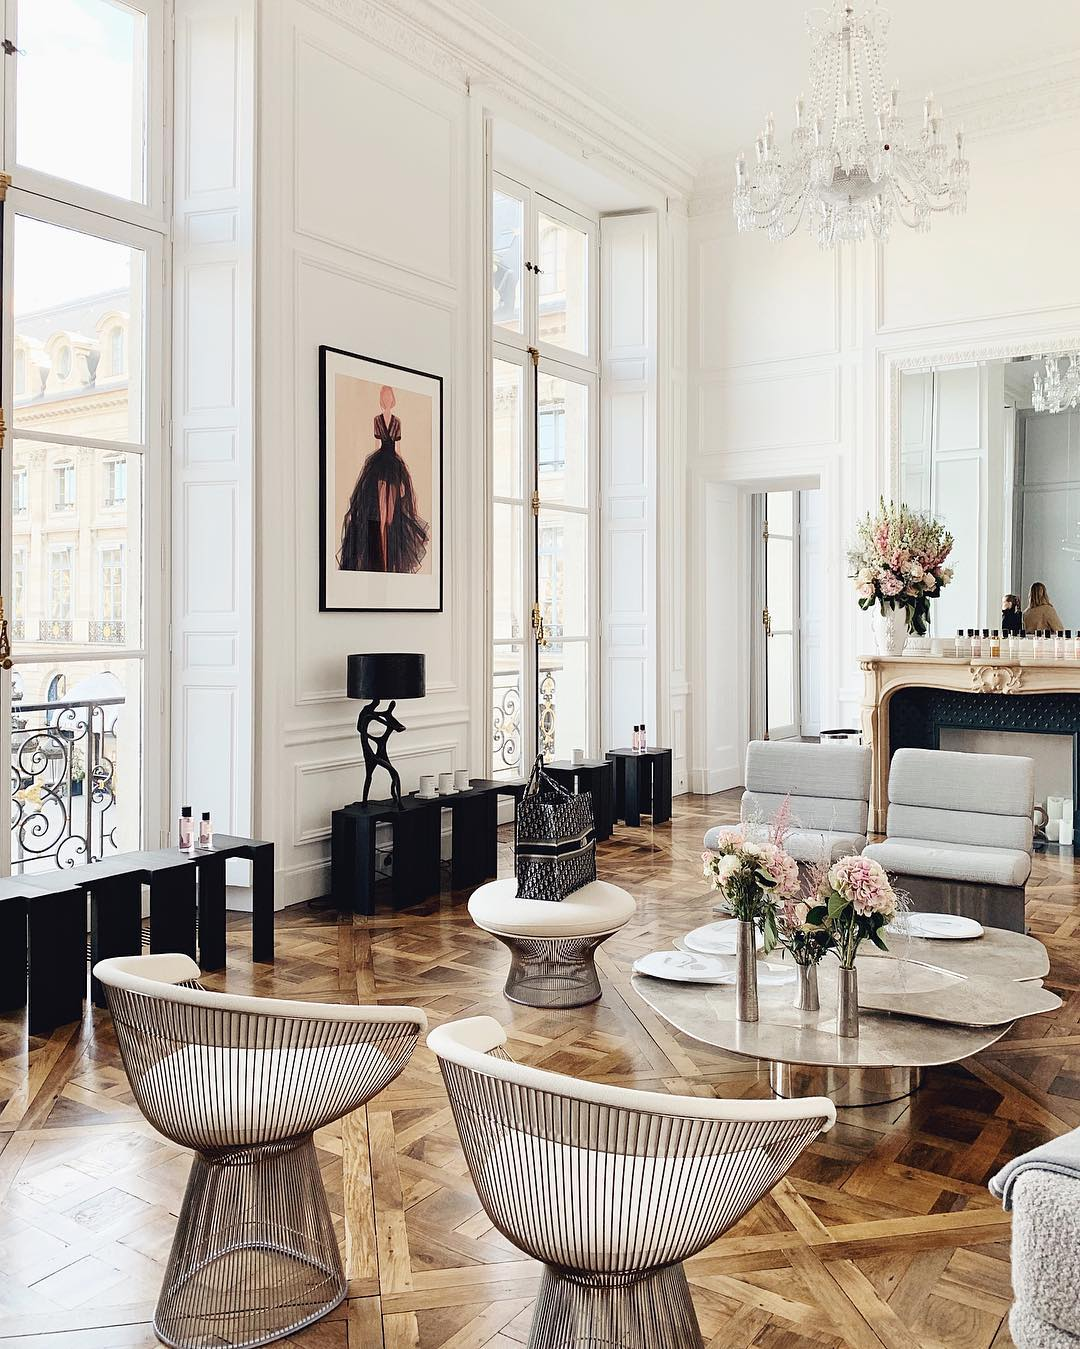 Parisian Accent Chairs - Soleil chairs in traditional Parisian apartment